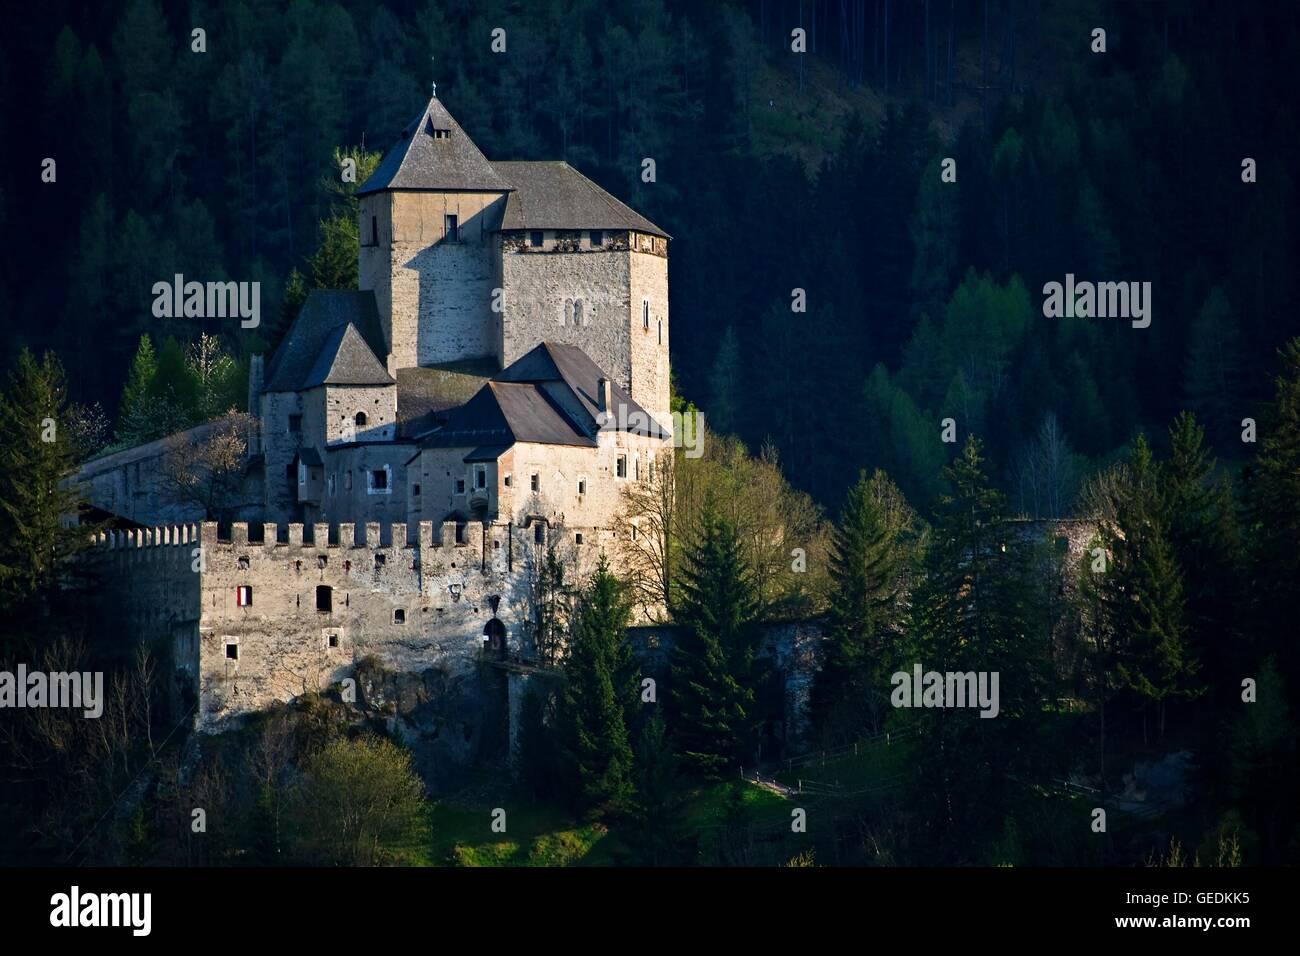 geography / travel, Austria, South Tirol / Vipiteno, Reifenstein Castle in Vipiteno (Sterzing), No-Exclusive-Use - Stock Image